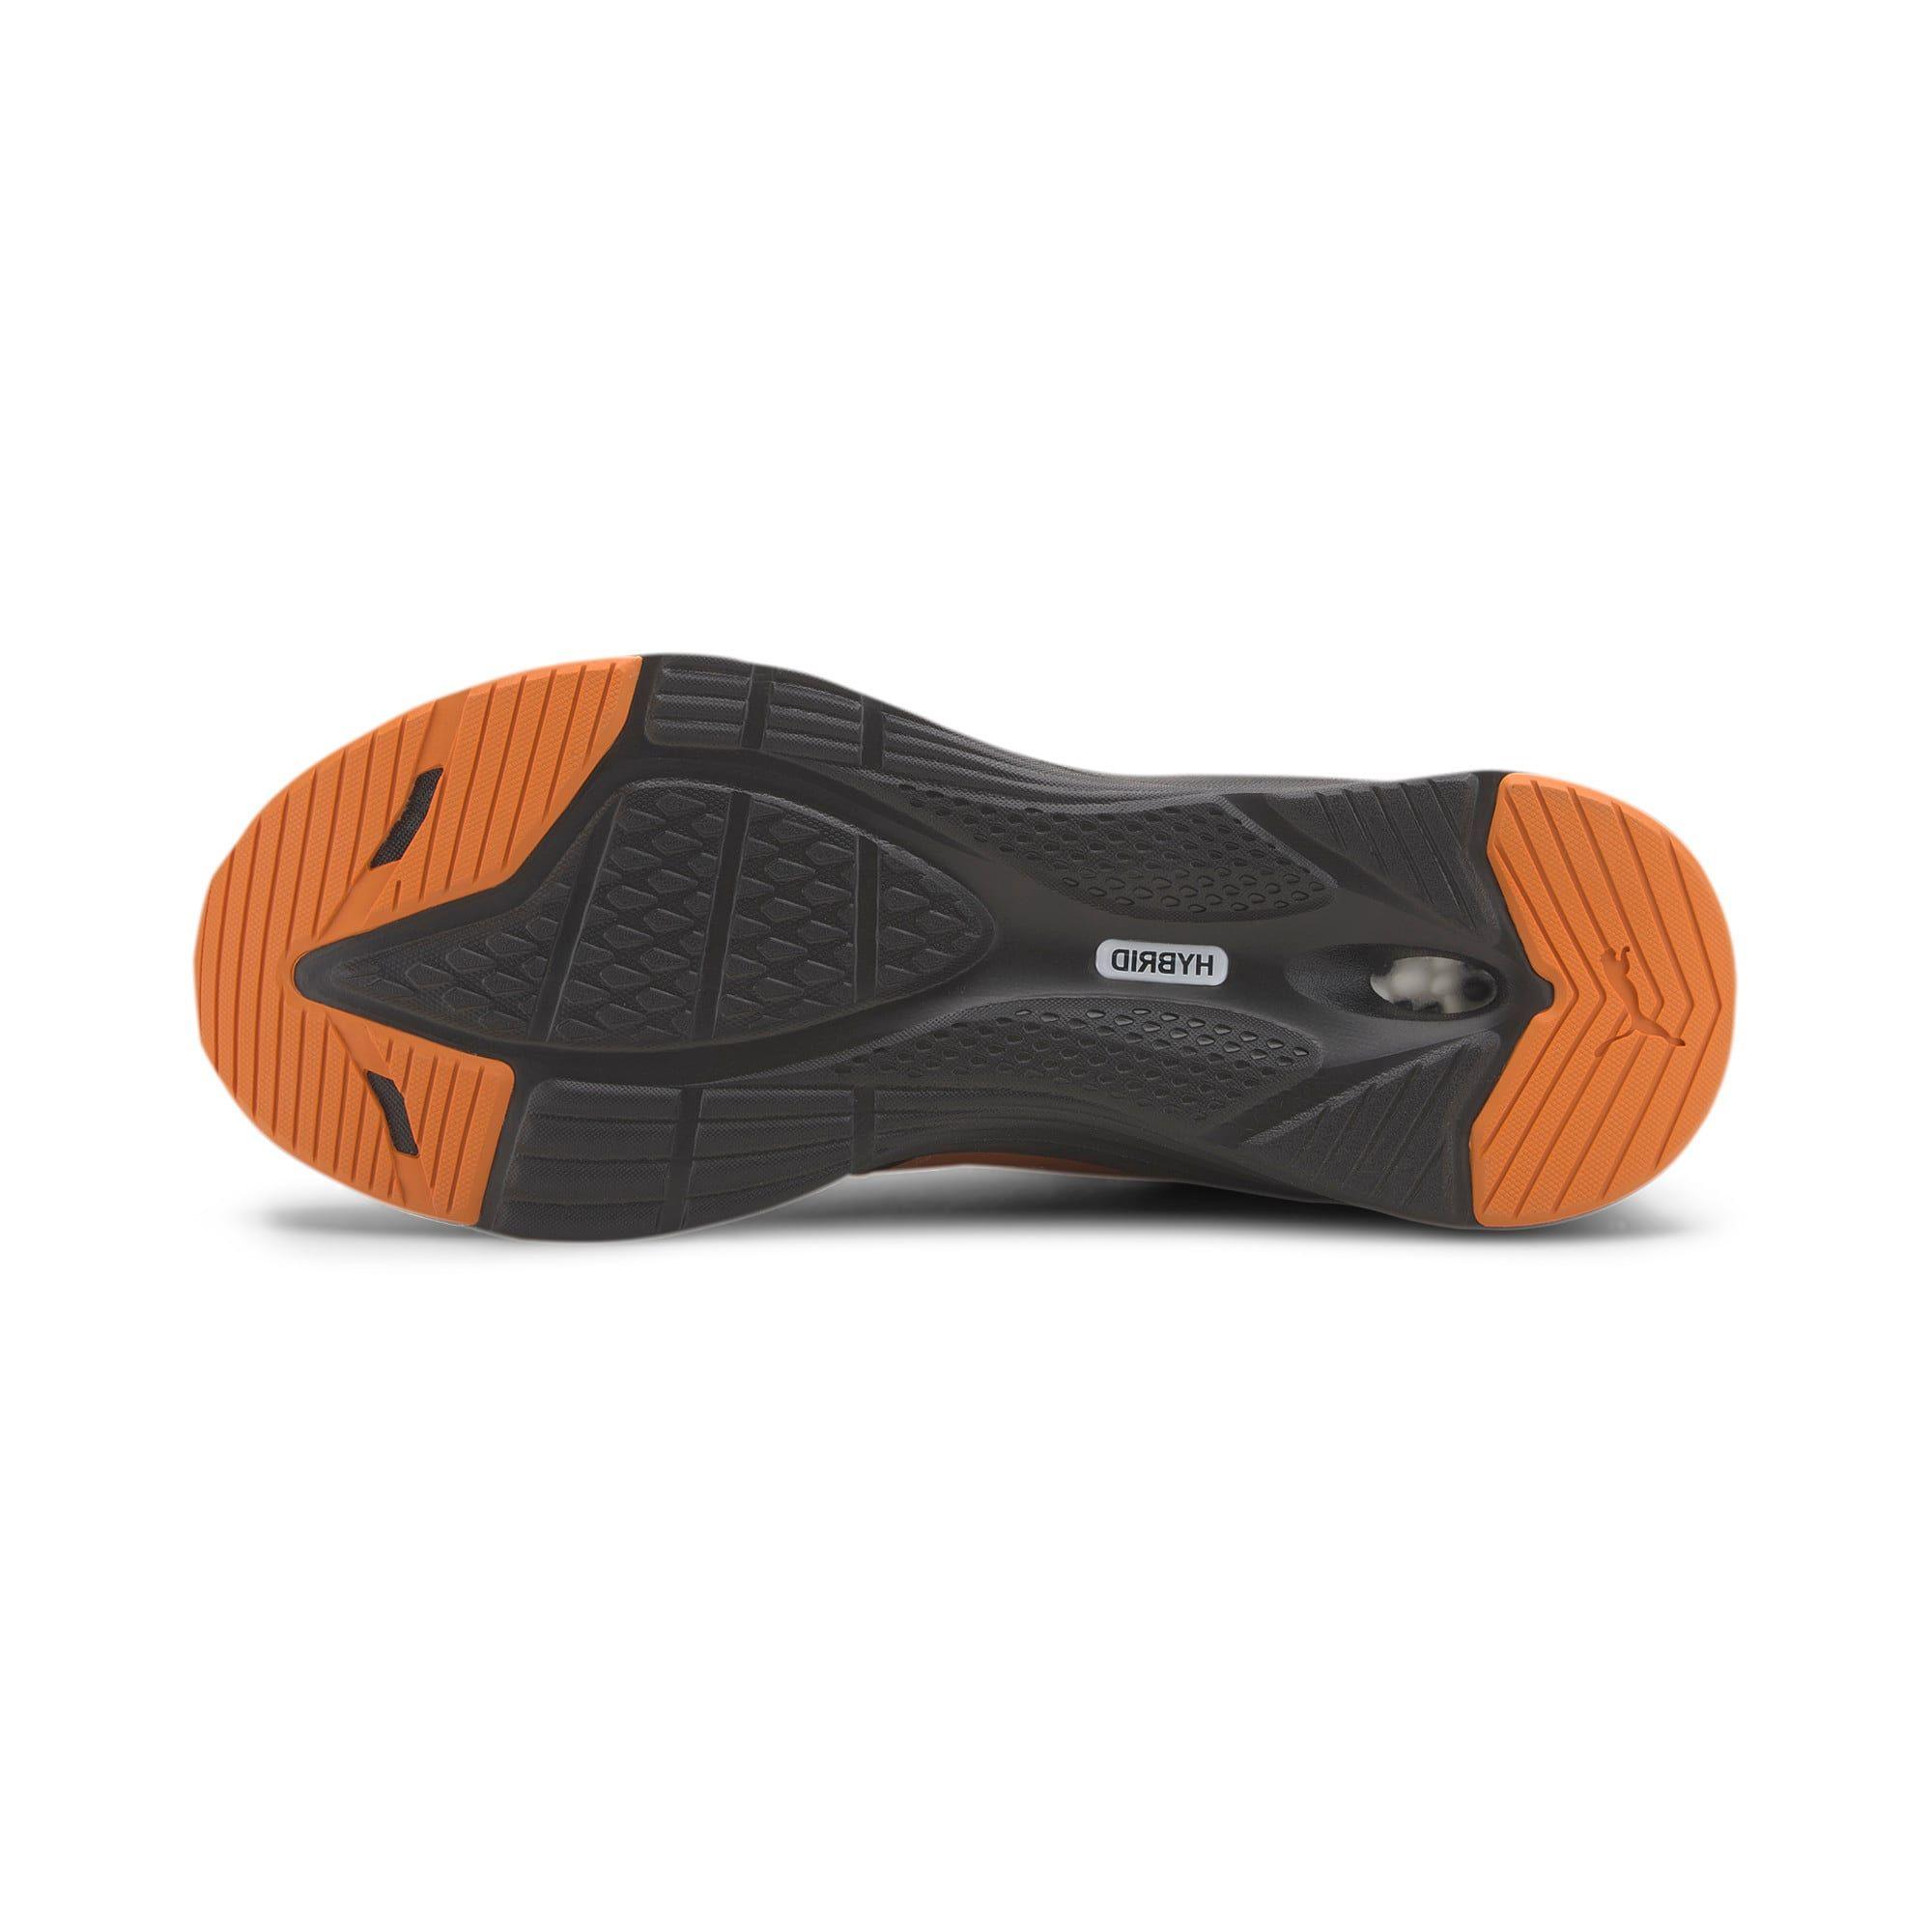 PUMA Hybrid Fuego Men's Running Shoes in Gibraltar Sea/Jaffa Orange size 10.5 #stylishmen